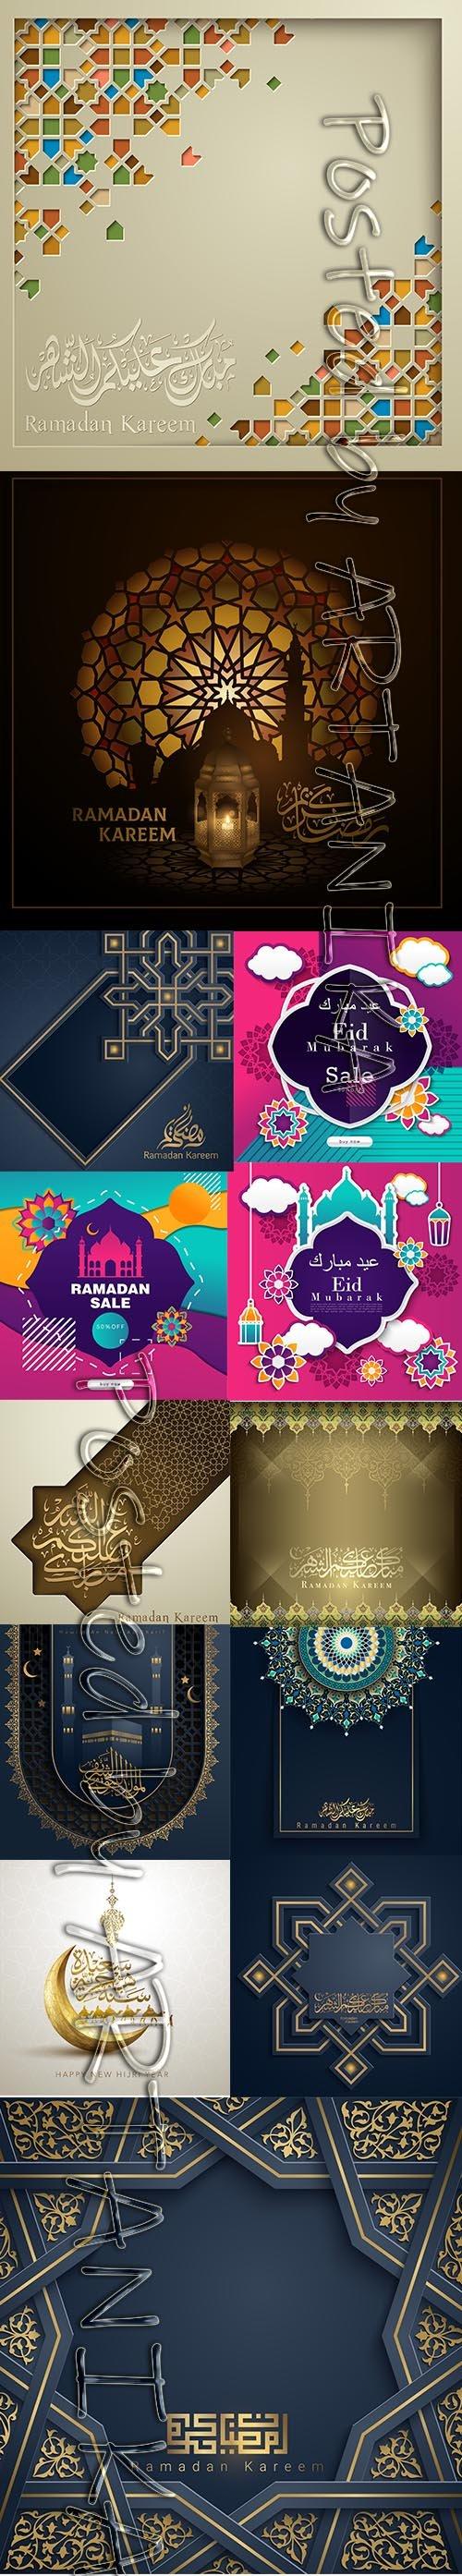 Vector Greeting Card of Arabic Design Illustrations Vol 3